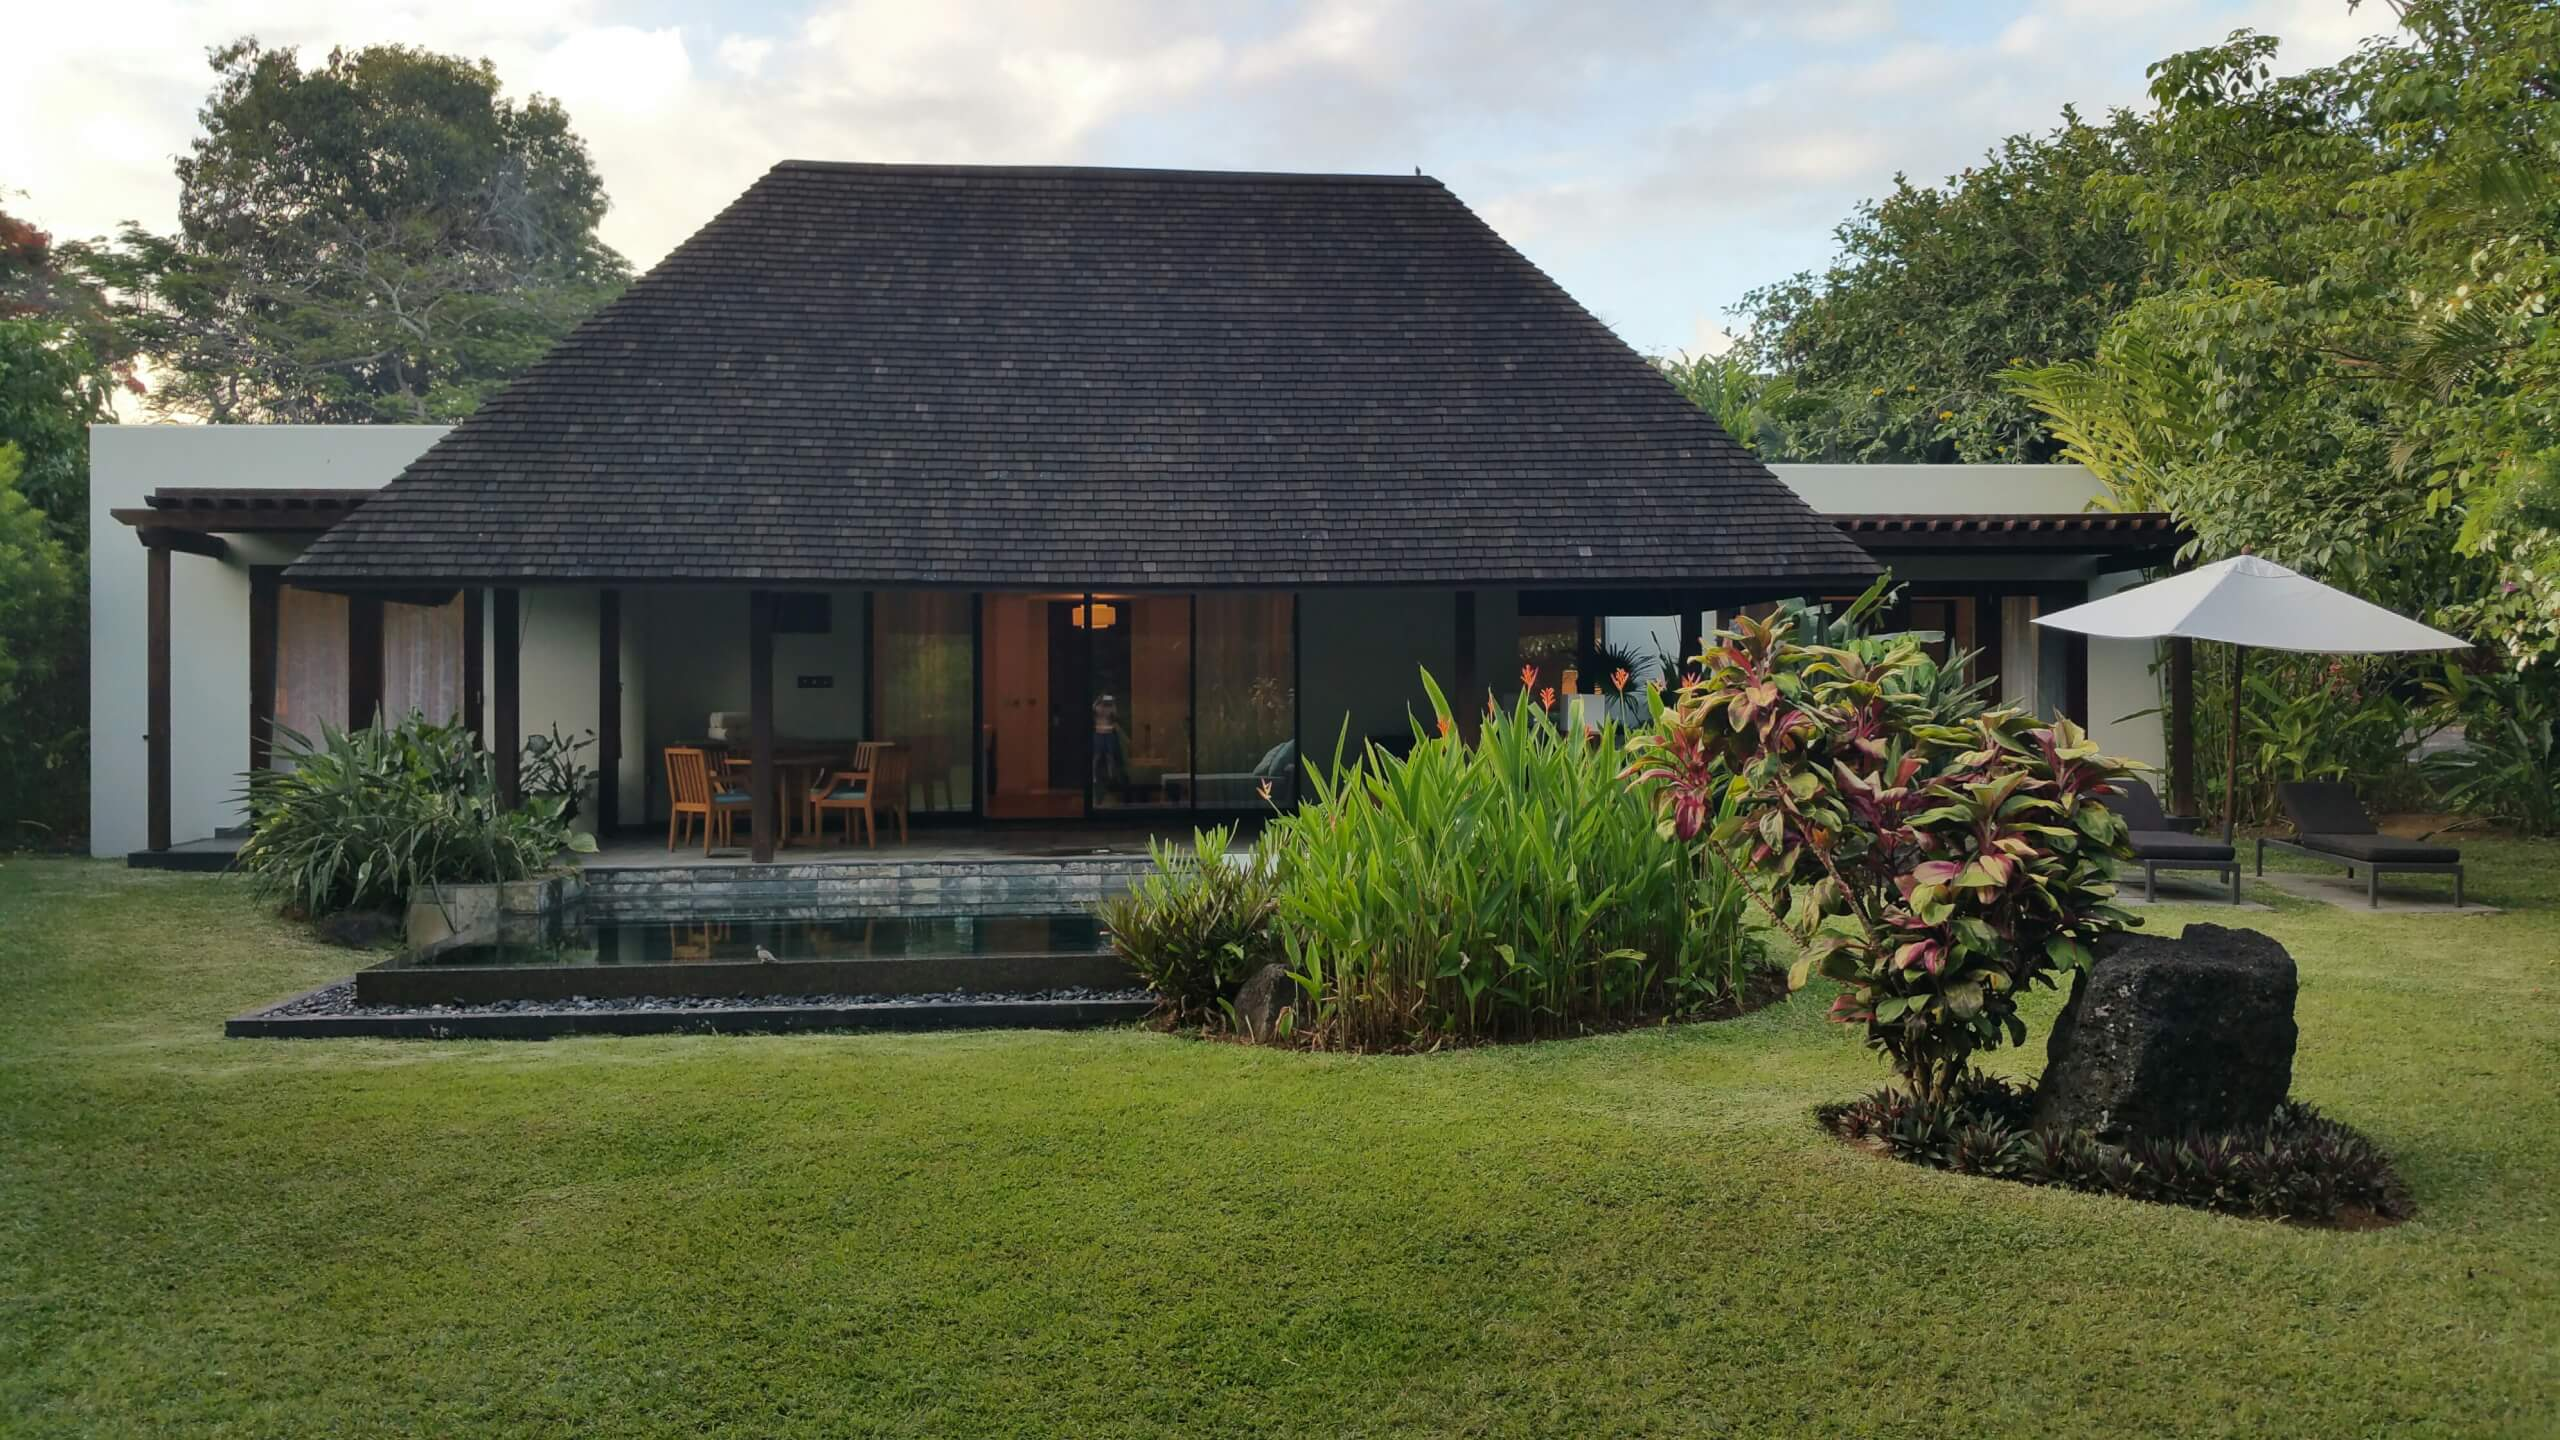 Holidays to Mauritius 48 Hour Travel Guide